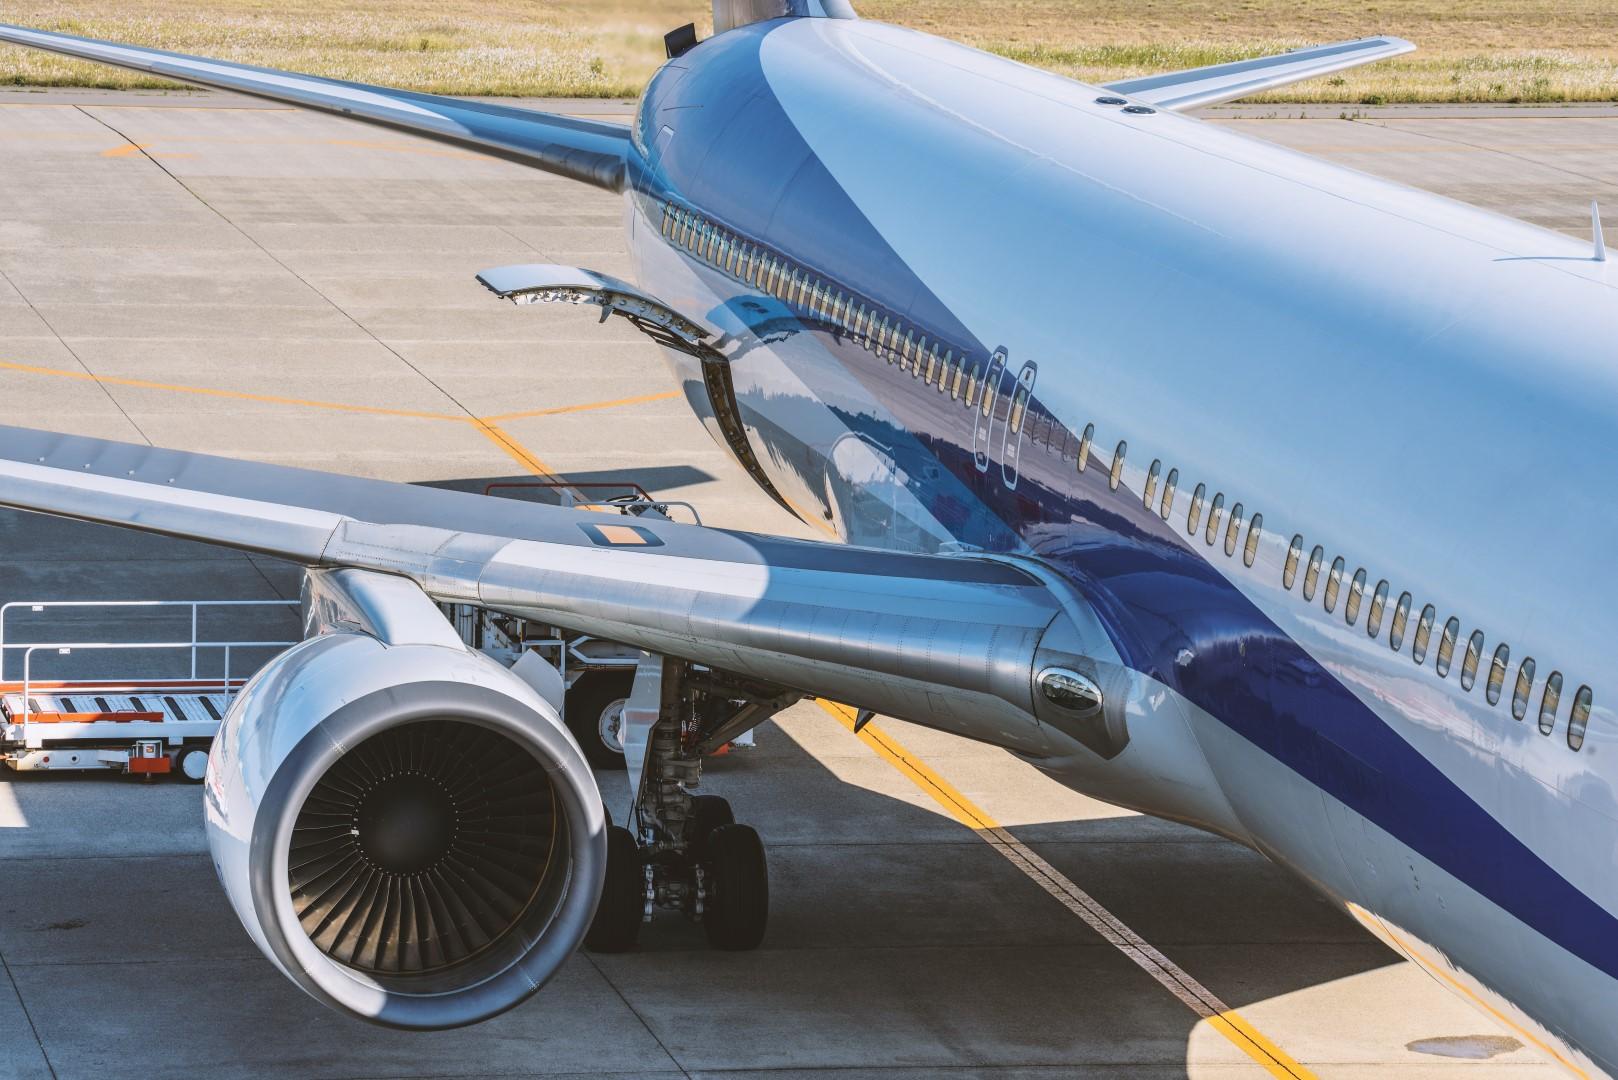 American Airlines Sees Unit Revenue Drop After Delta's Weak Outlook